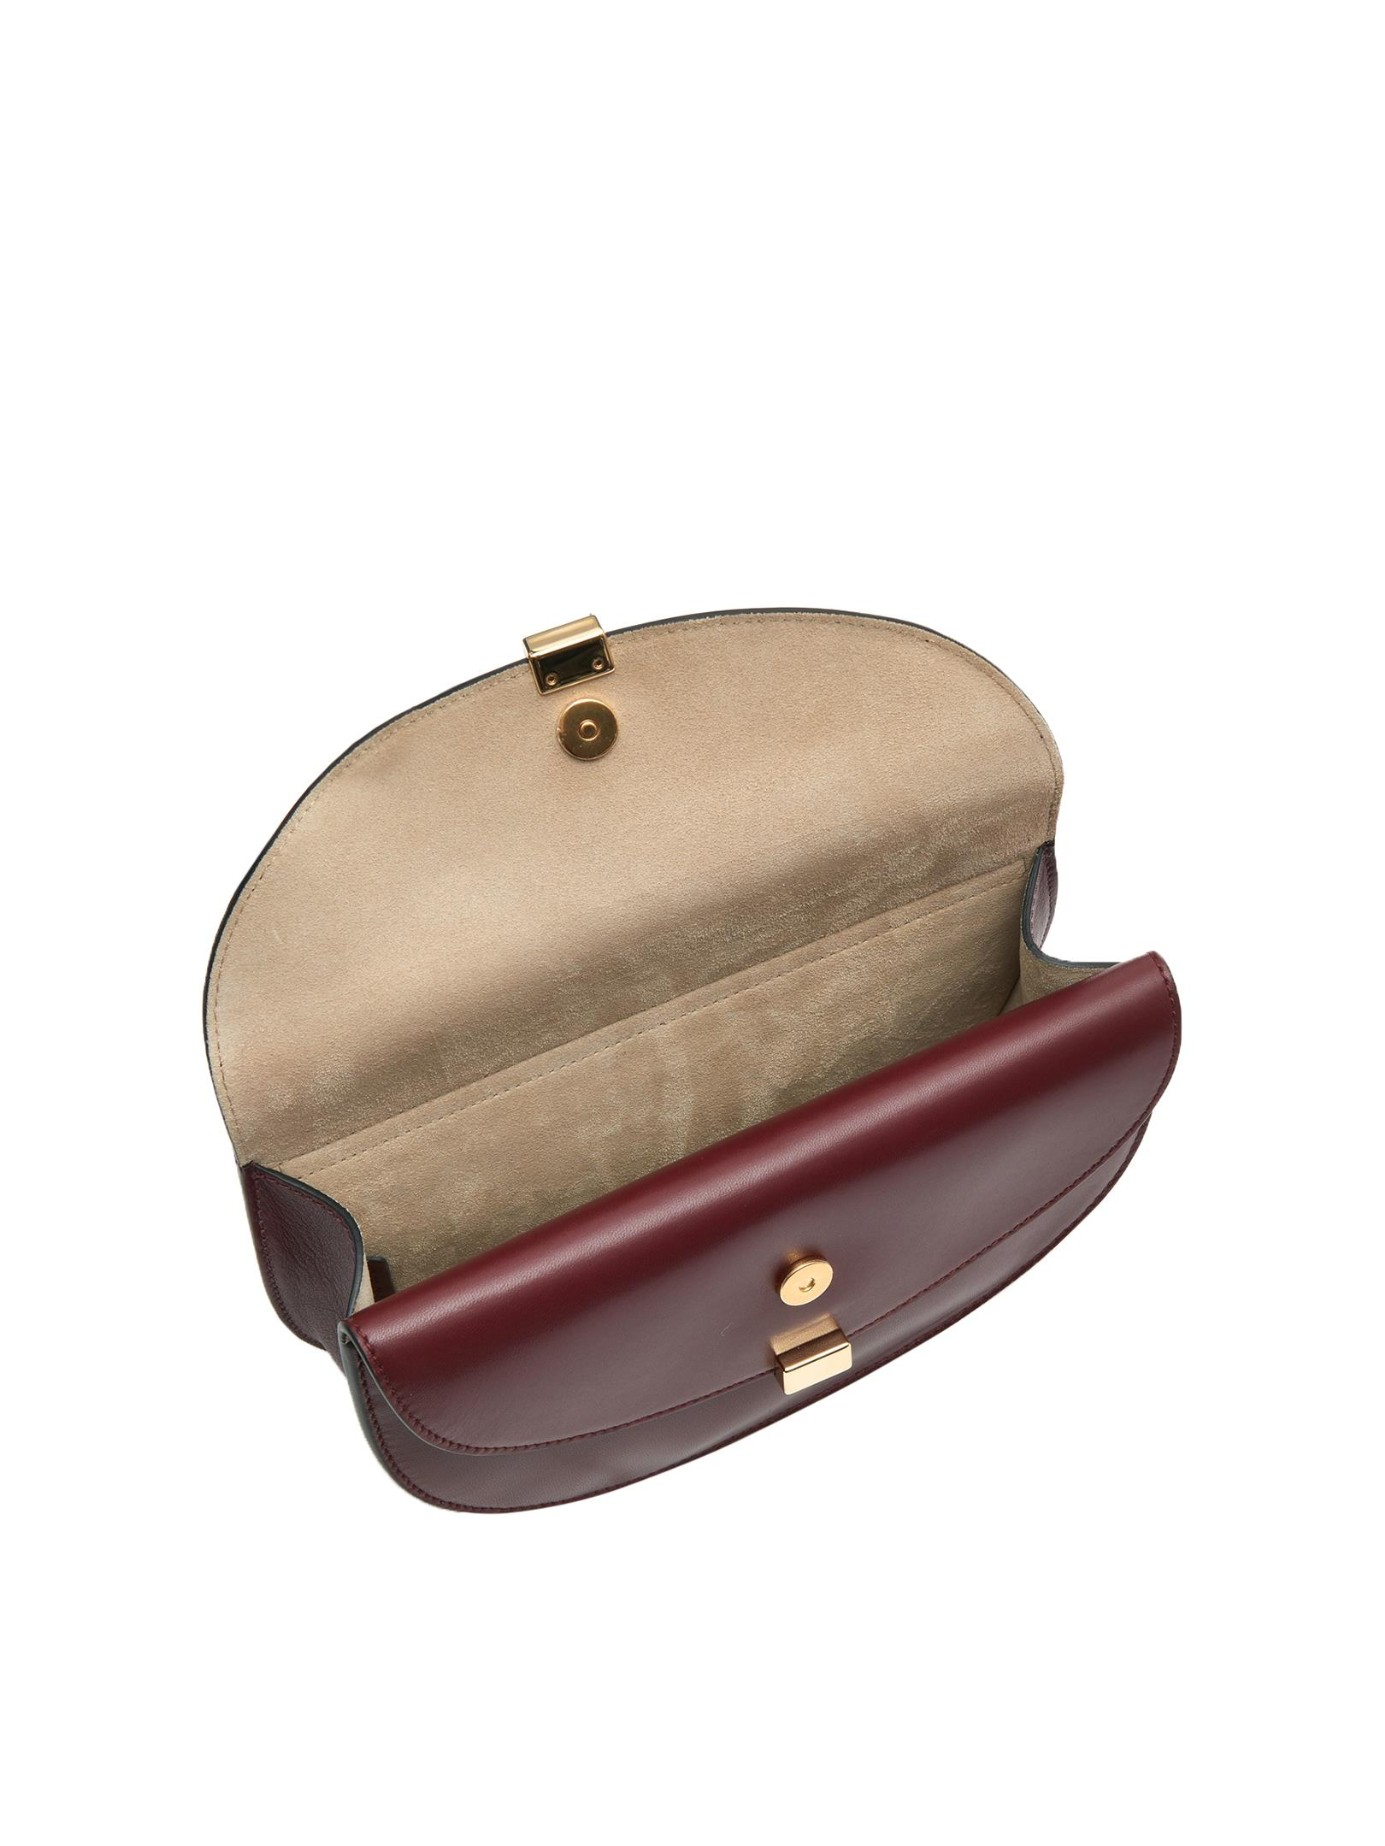 chloe best replica - chloe georgia mini bag, best chloe replica handbags